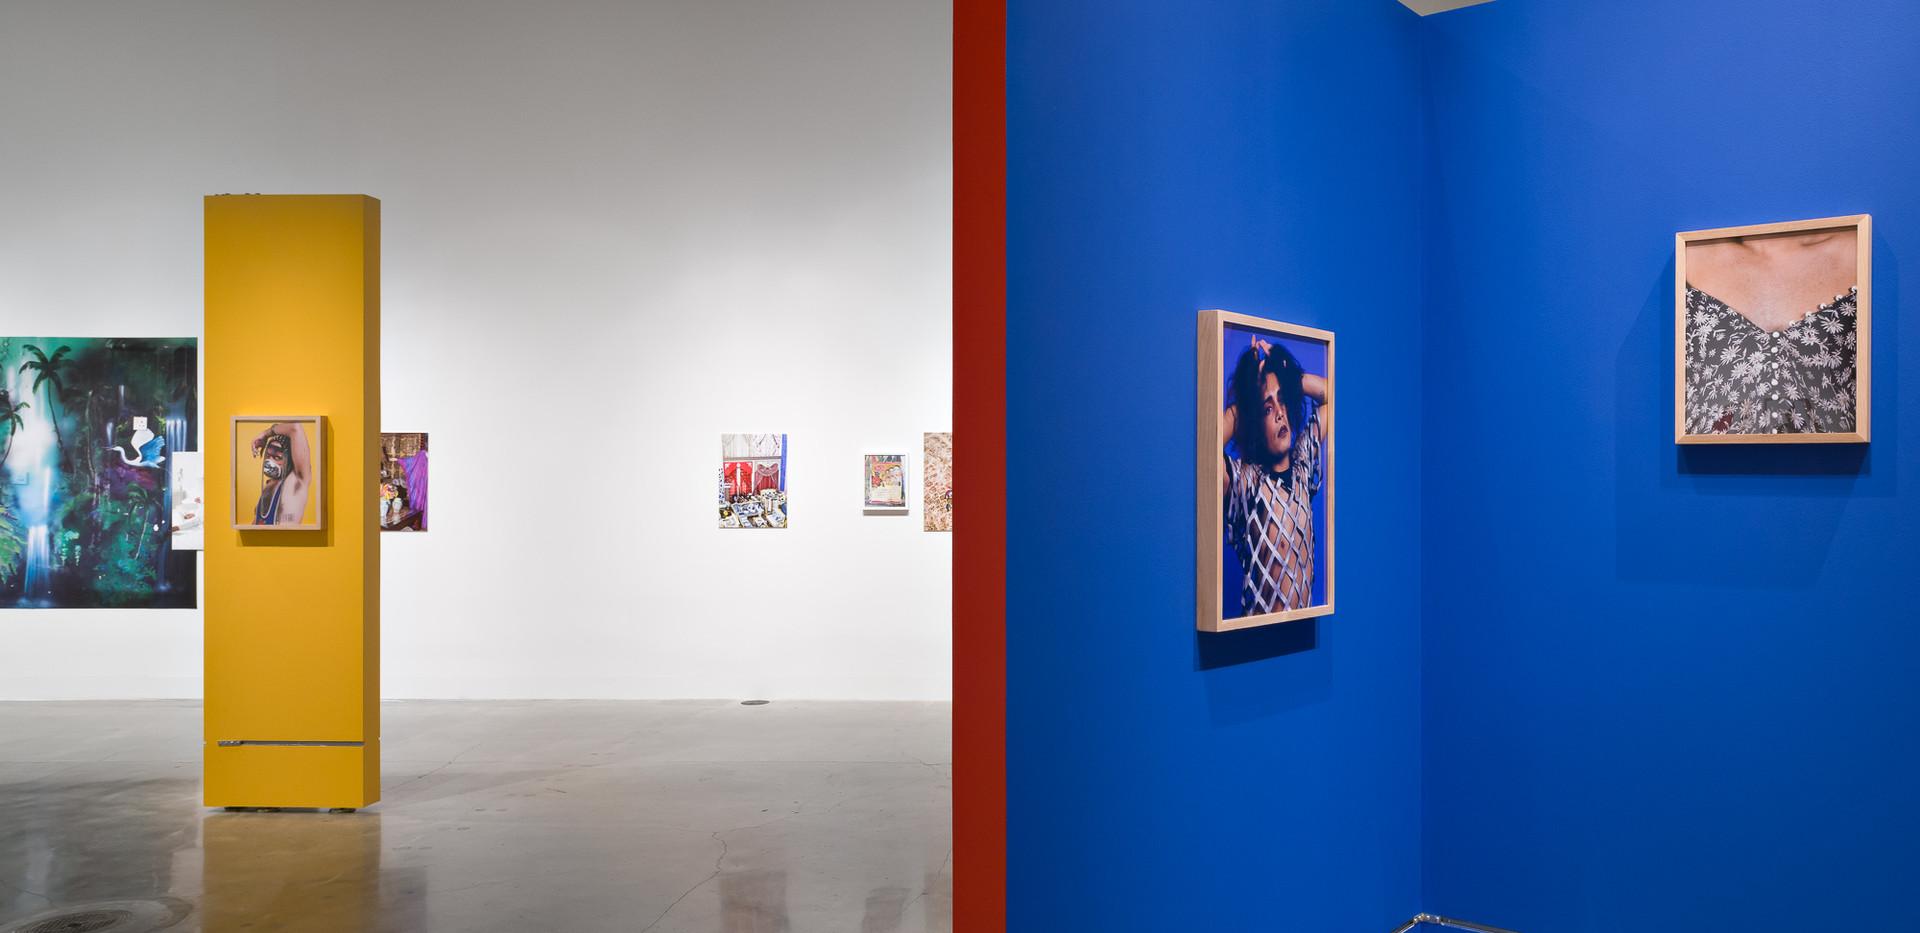 Conversation 7 - Entre Nos documentation at San Francisco Arts Commission Galleries. Photos by Phillip Maisel